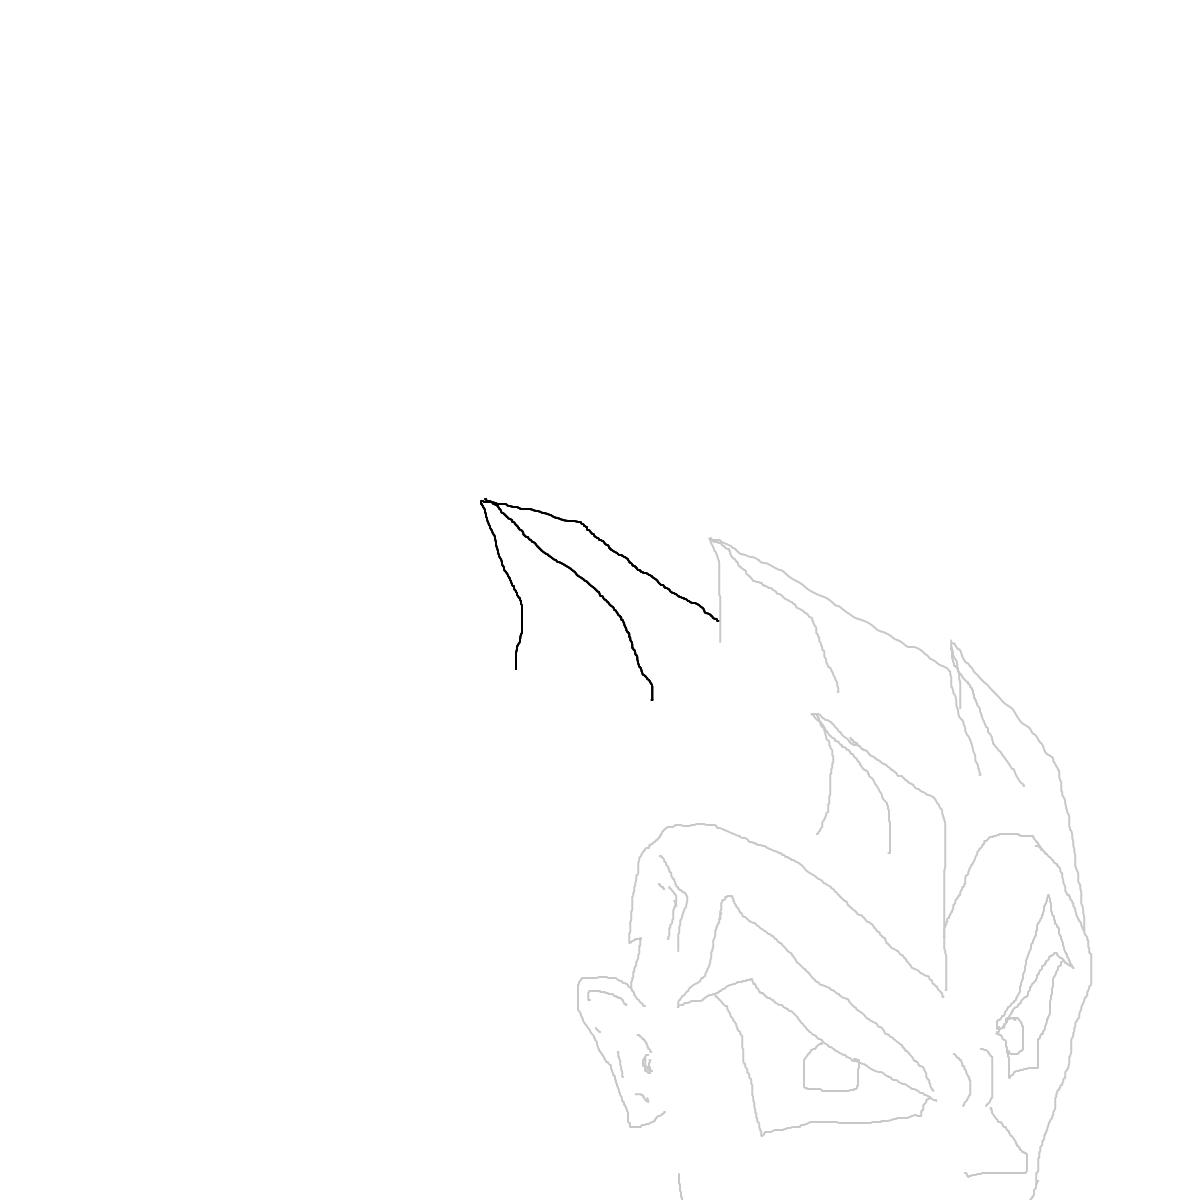 BAAAM drawing#5747 lat:35.6001777648925800lng: 139.4081268310547000